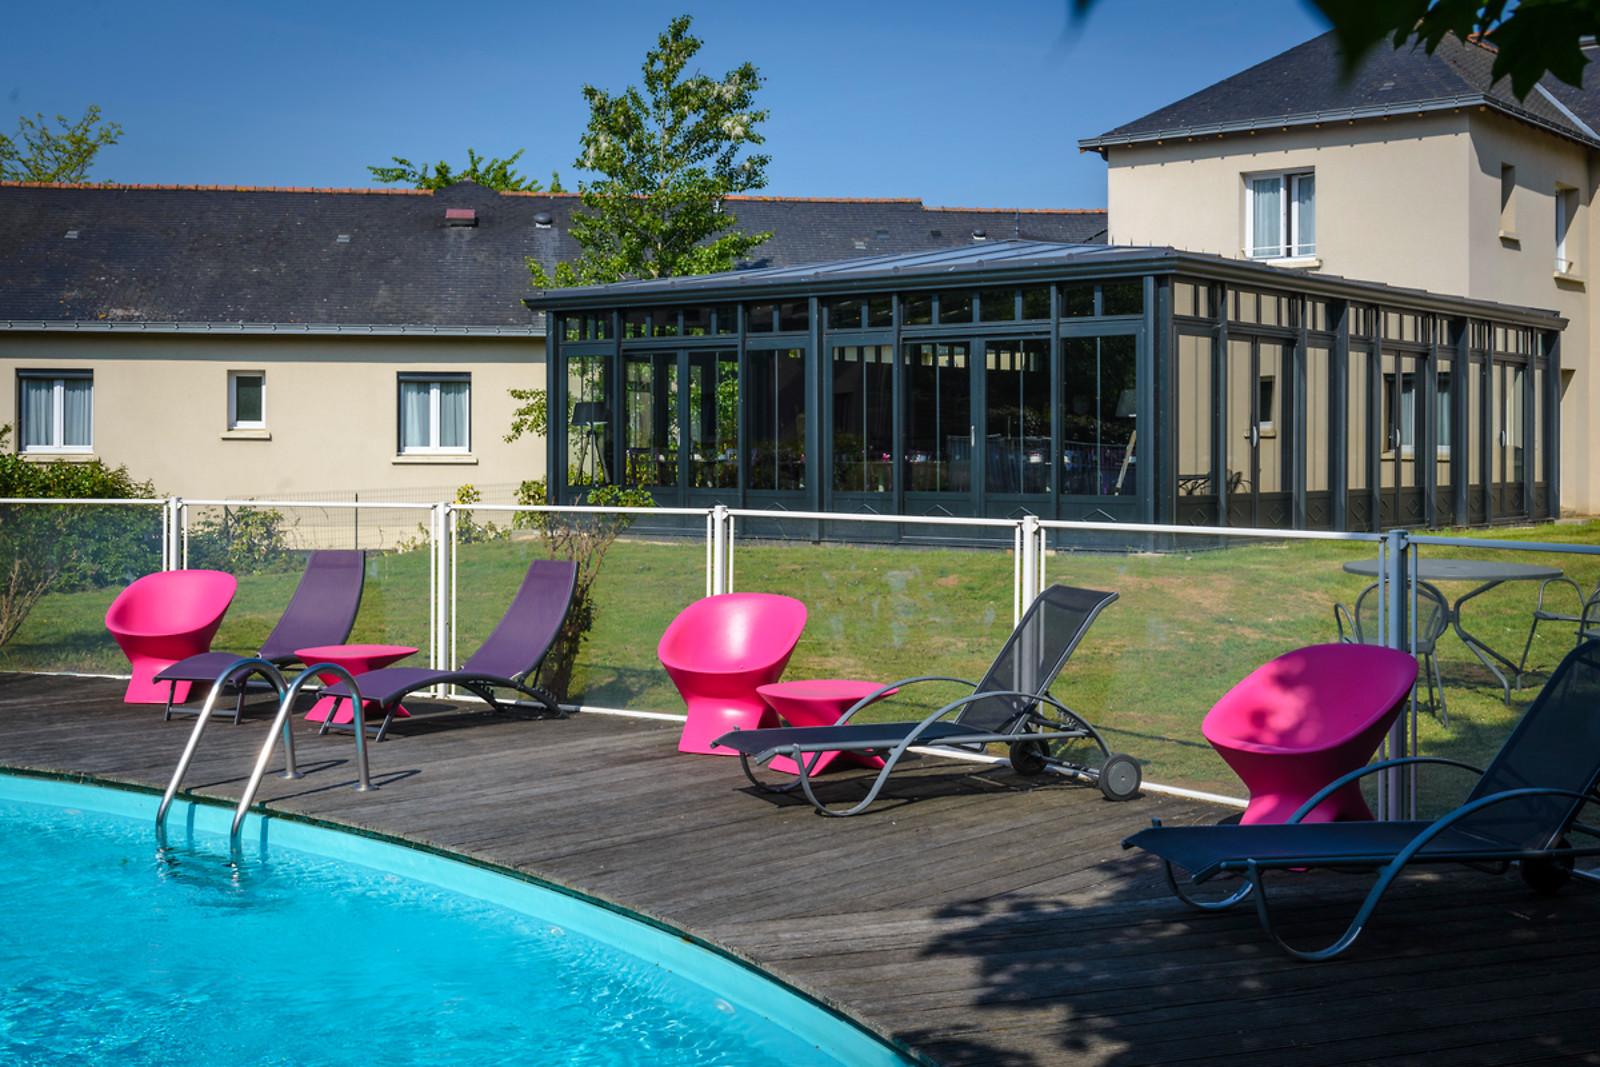 Hotel Formule  Doue La Fontaine